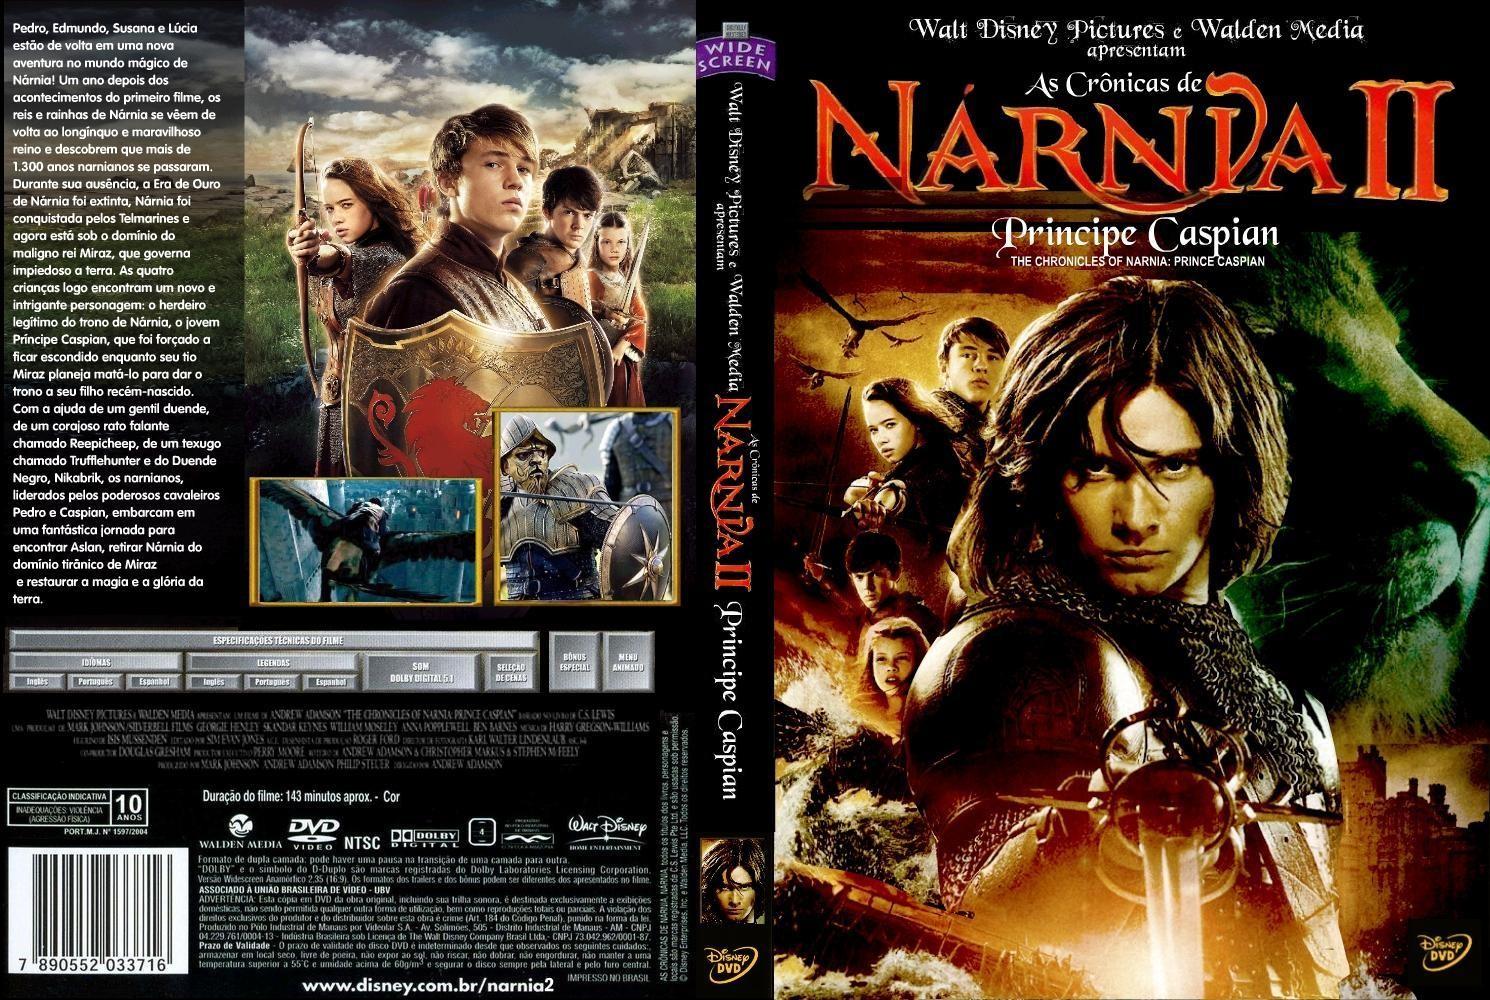 http://1.bp.blogspot.com/-vY6my90d5FA/Tys0K3VoV1I/AAAAAAAAAtY/y7n6_T0IueY/s1600/capa+Chronicles_Of_Narnia_The_Prince_Caspian__.jpg